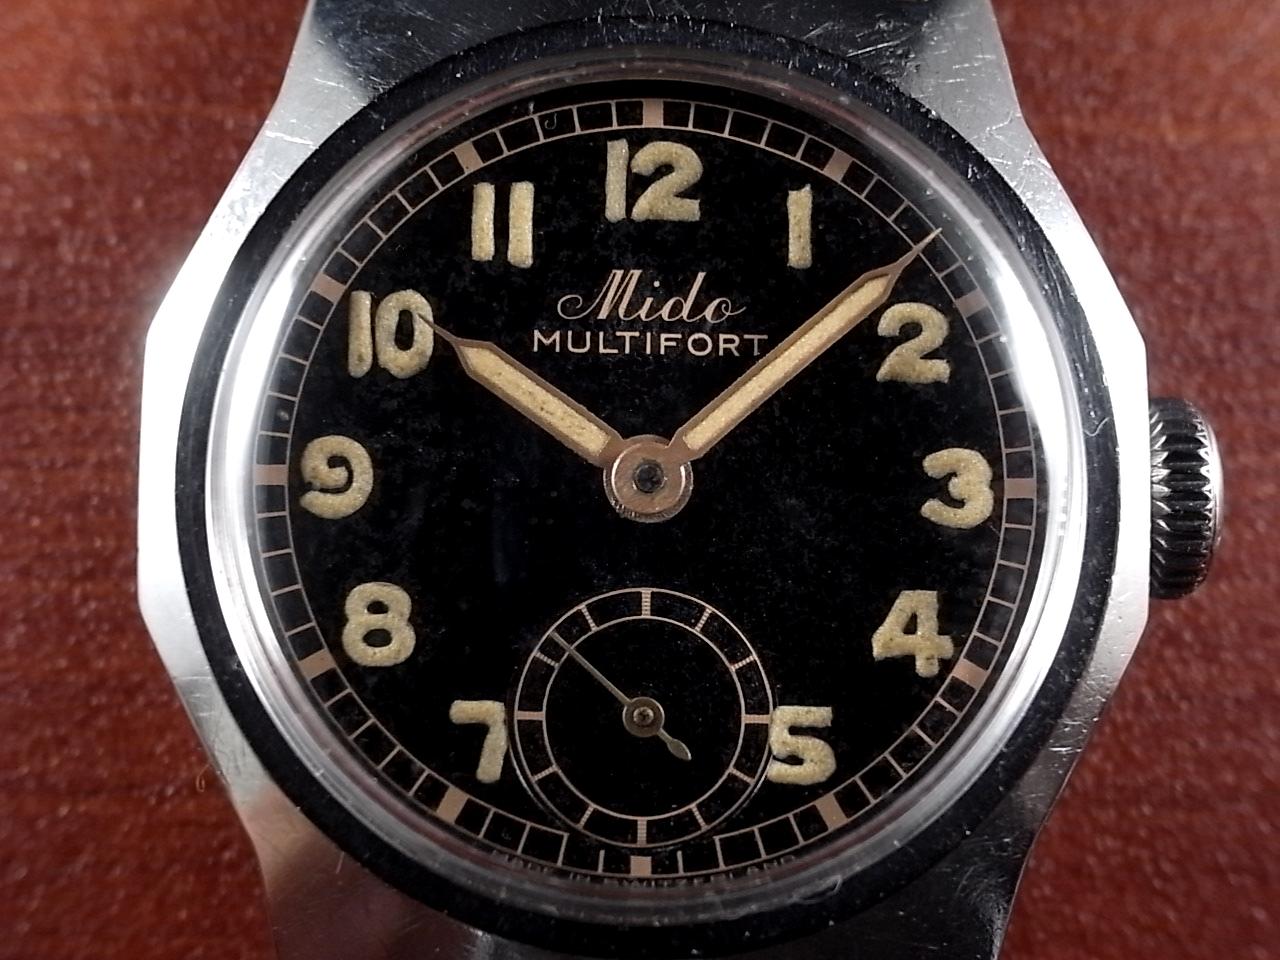 MIDO ミドー マルチフォート ブラックミラー マニュアルワインド 1940年代の写真2枚目